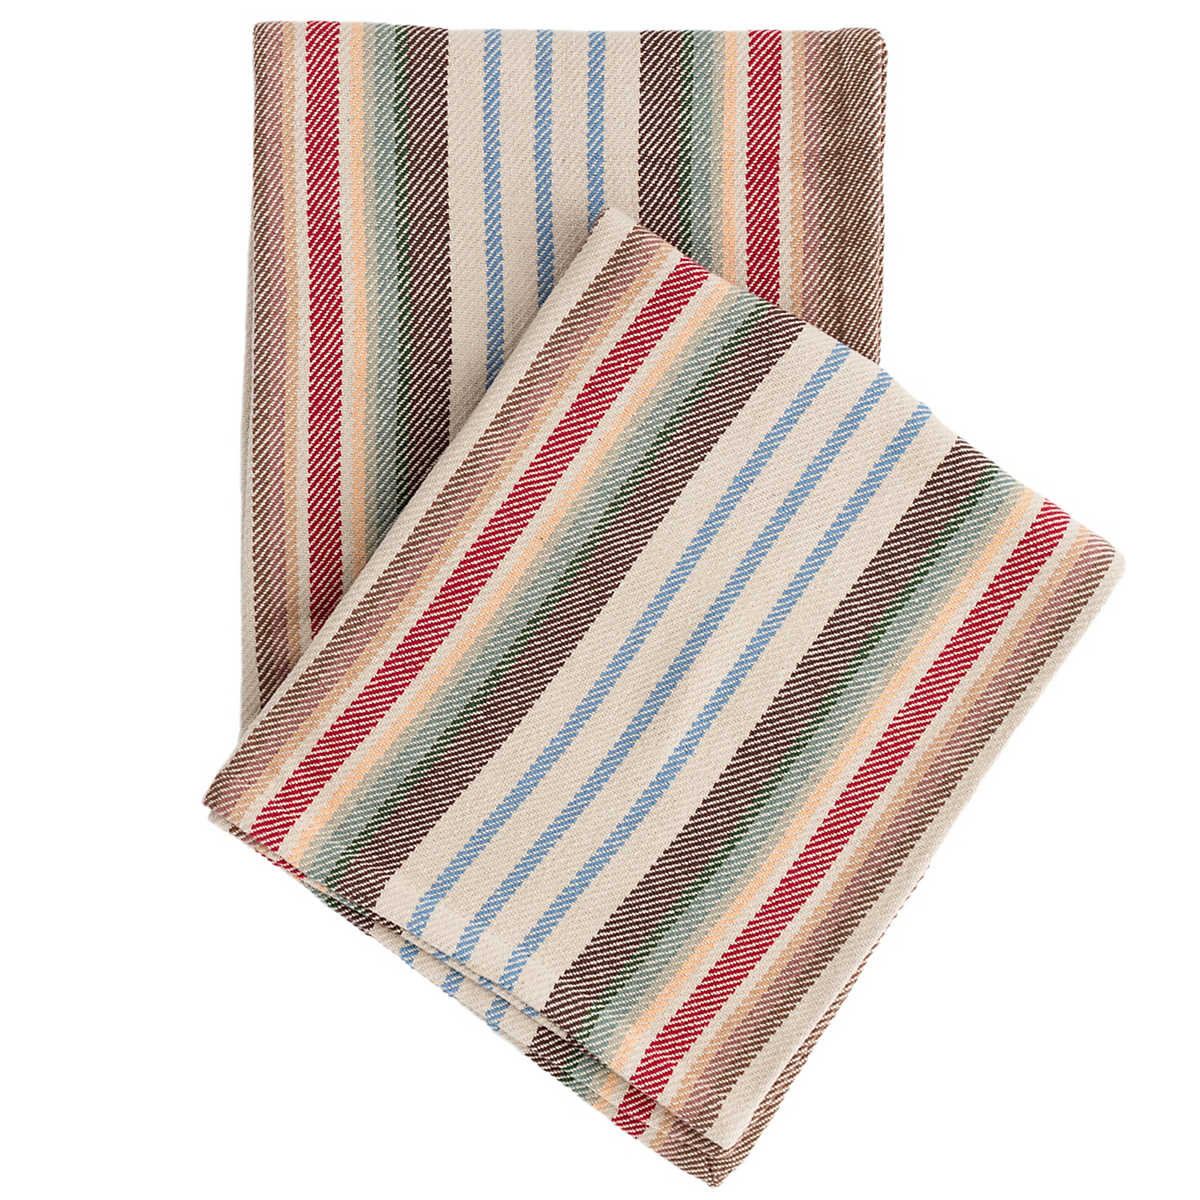 Ranch stripe woven cotton throw dash albert for Dash and albert blankets